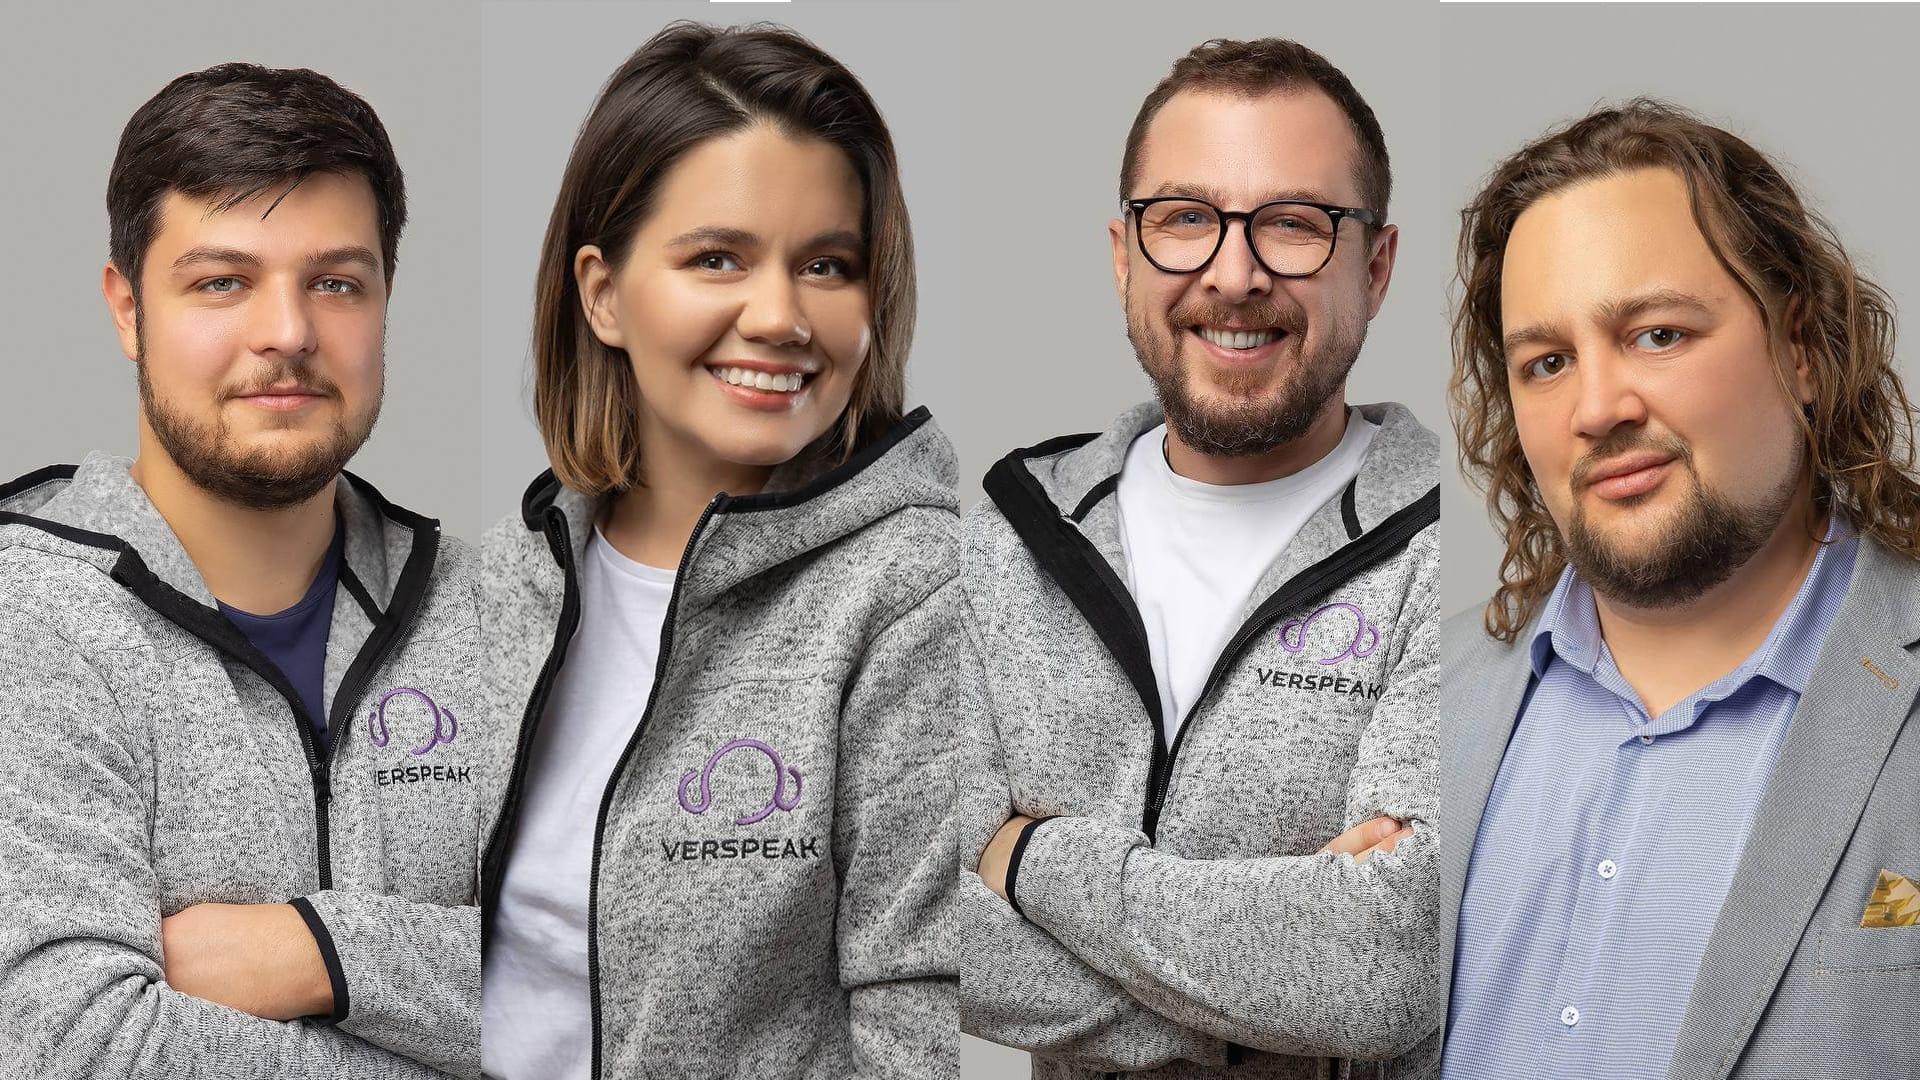 Photos of the management team of Verspeak